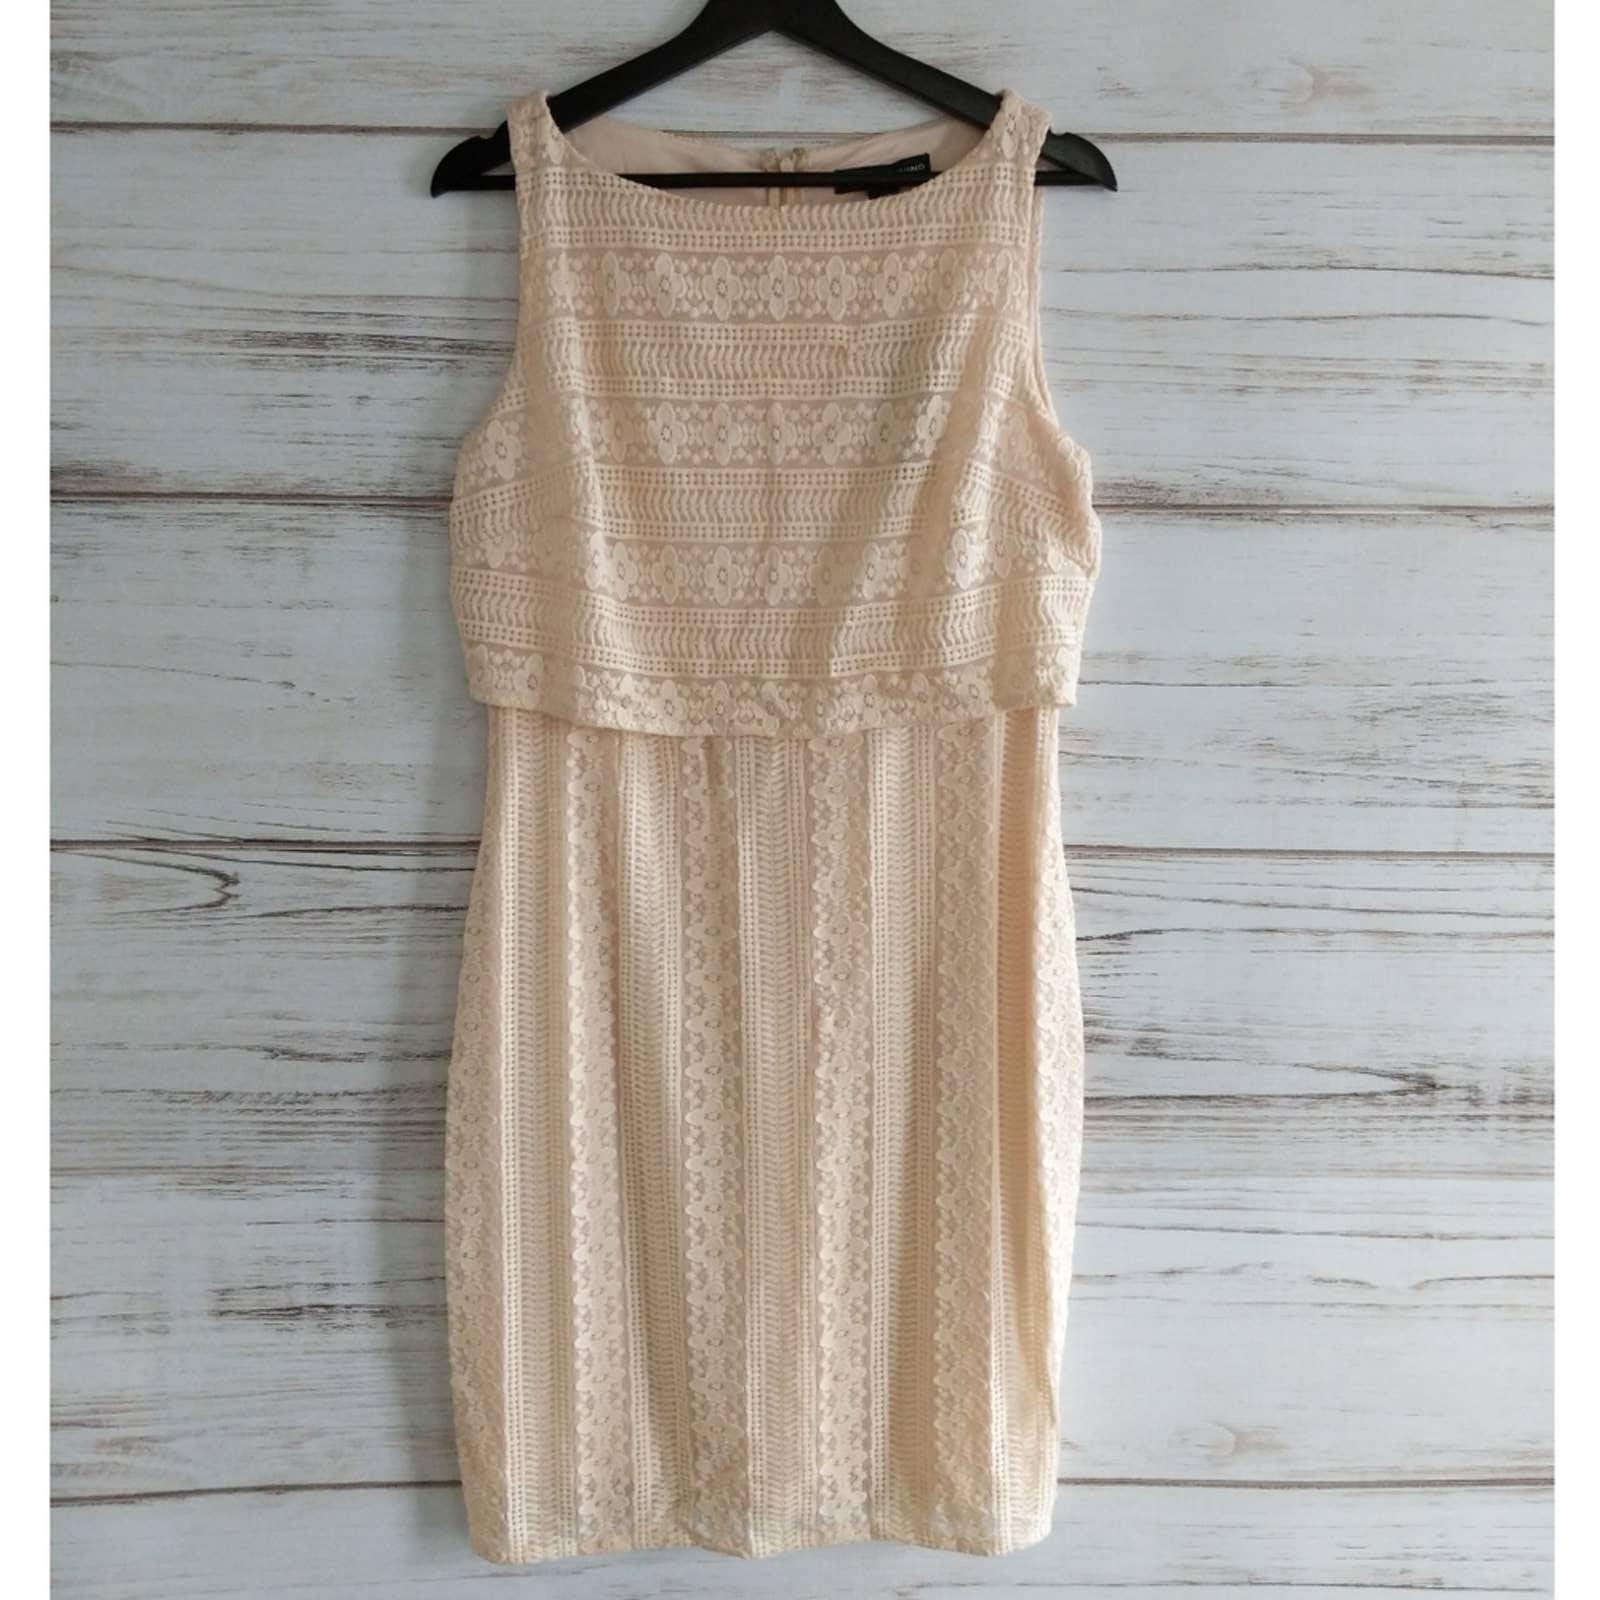 NWT American Living Blush Lace Dress 12